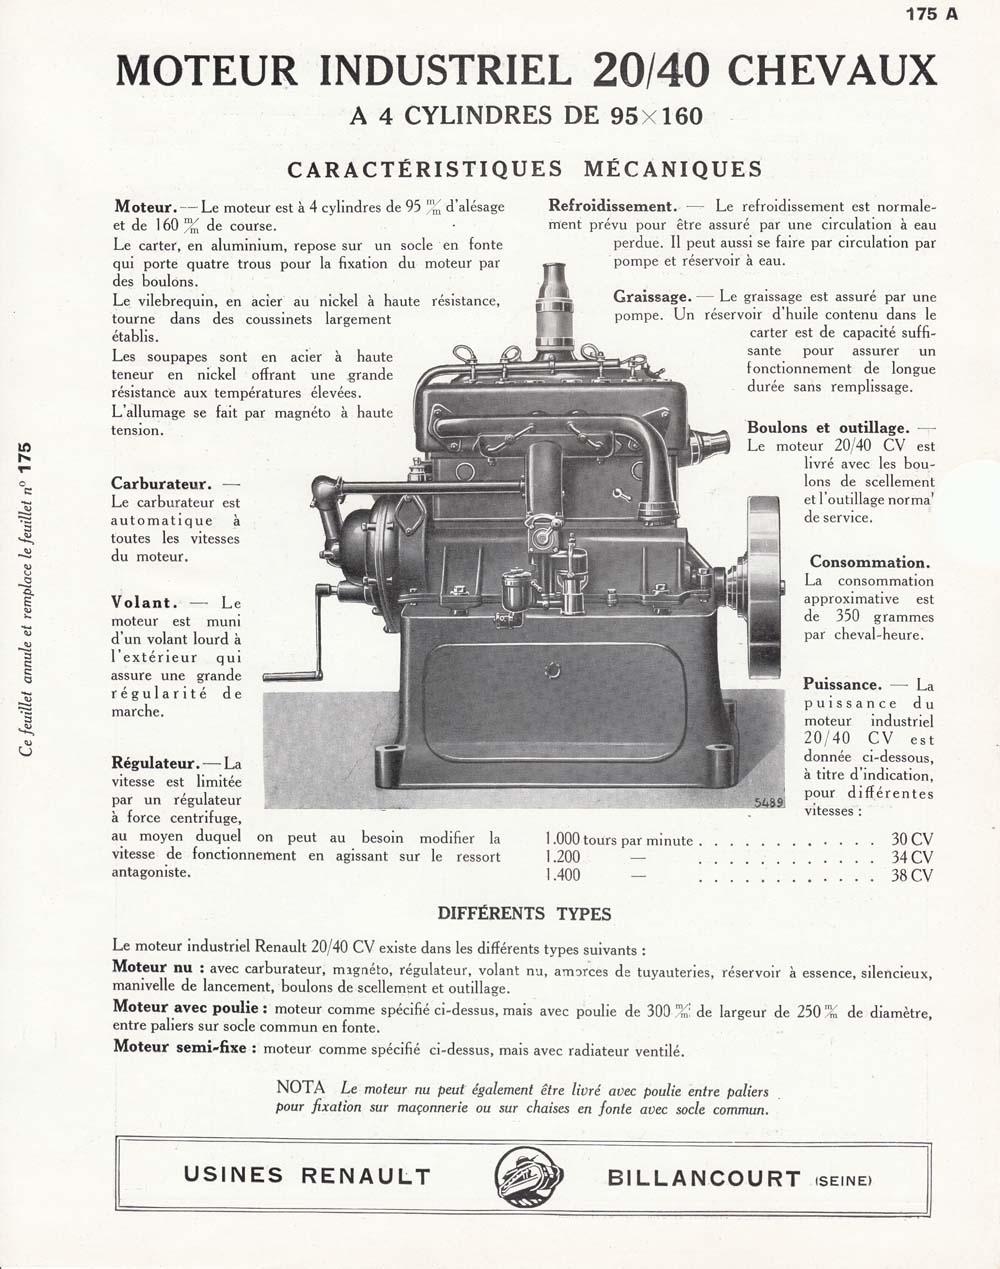 moteur_industriel_20_40cv_4cyl_1.jpg